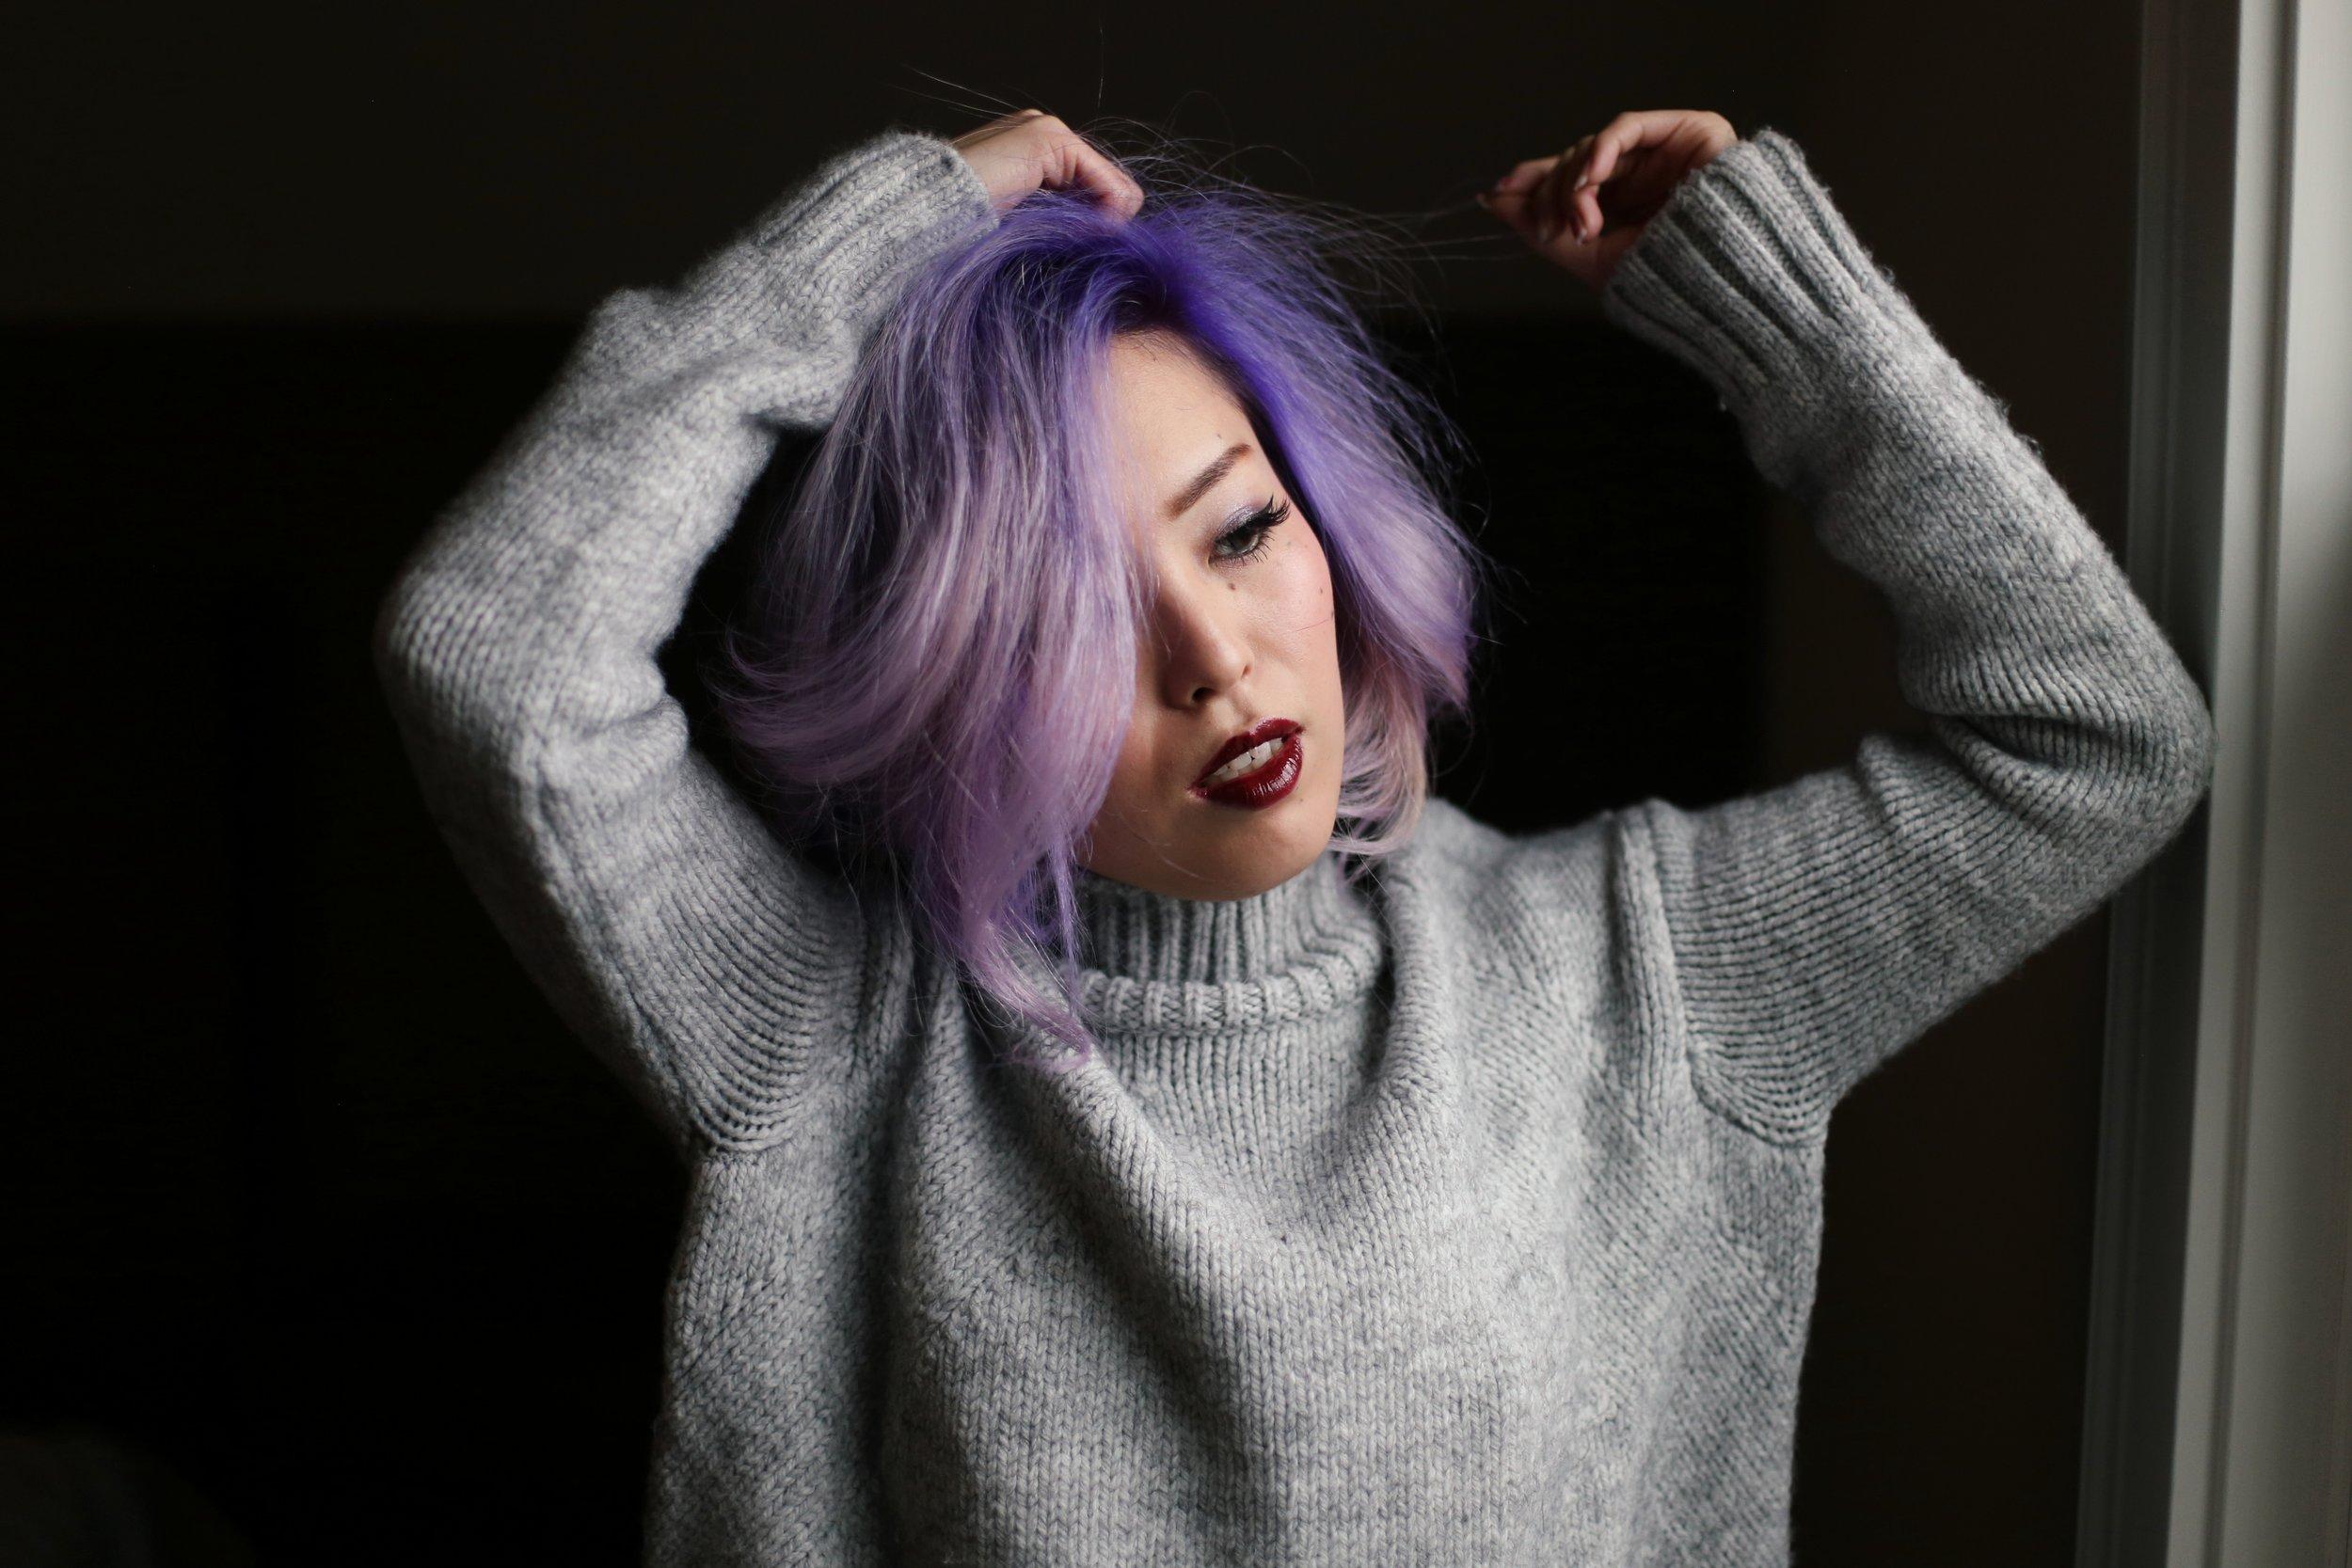 Boudoir Photo-black and white photography-sweater weather-turtle neck sweater-black lingerie-dark lipstick-japanese-Aika's Love Closet-Seattle model-Seattle Style blogger-Lavender Hair-colored Hair-Mermaid Hair-Zara Sweater 6